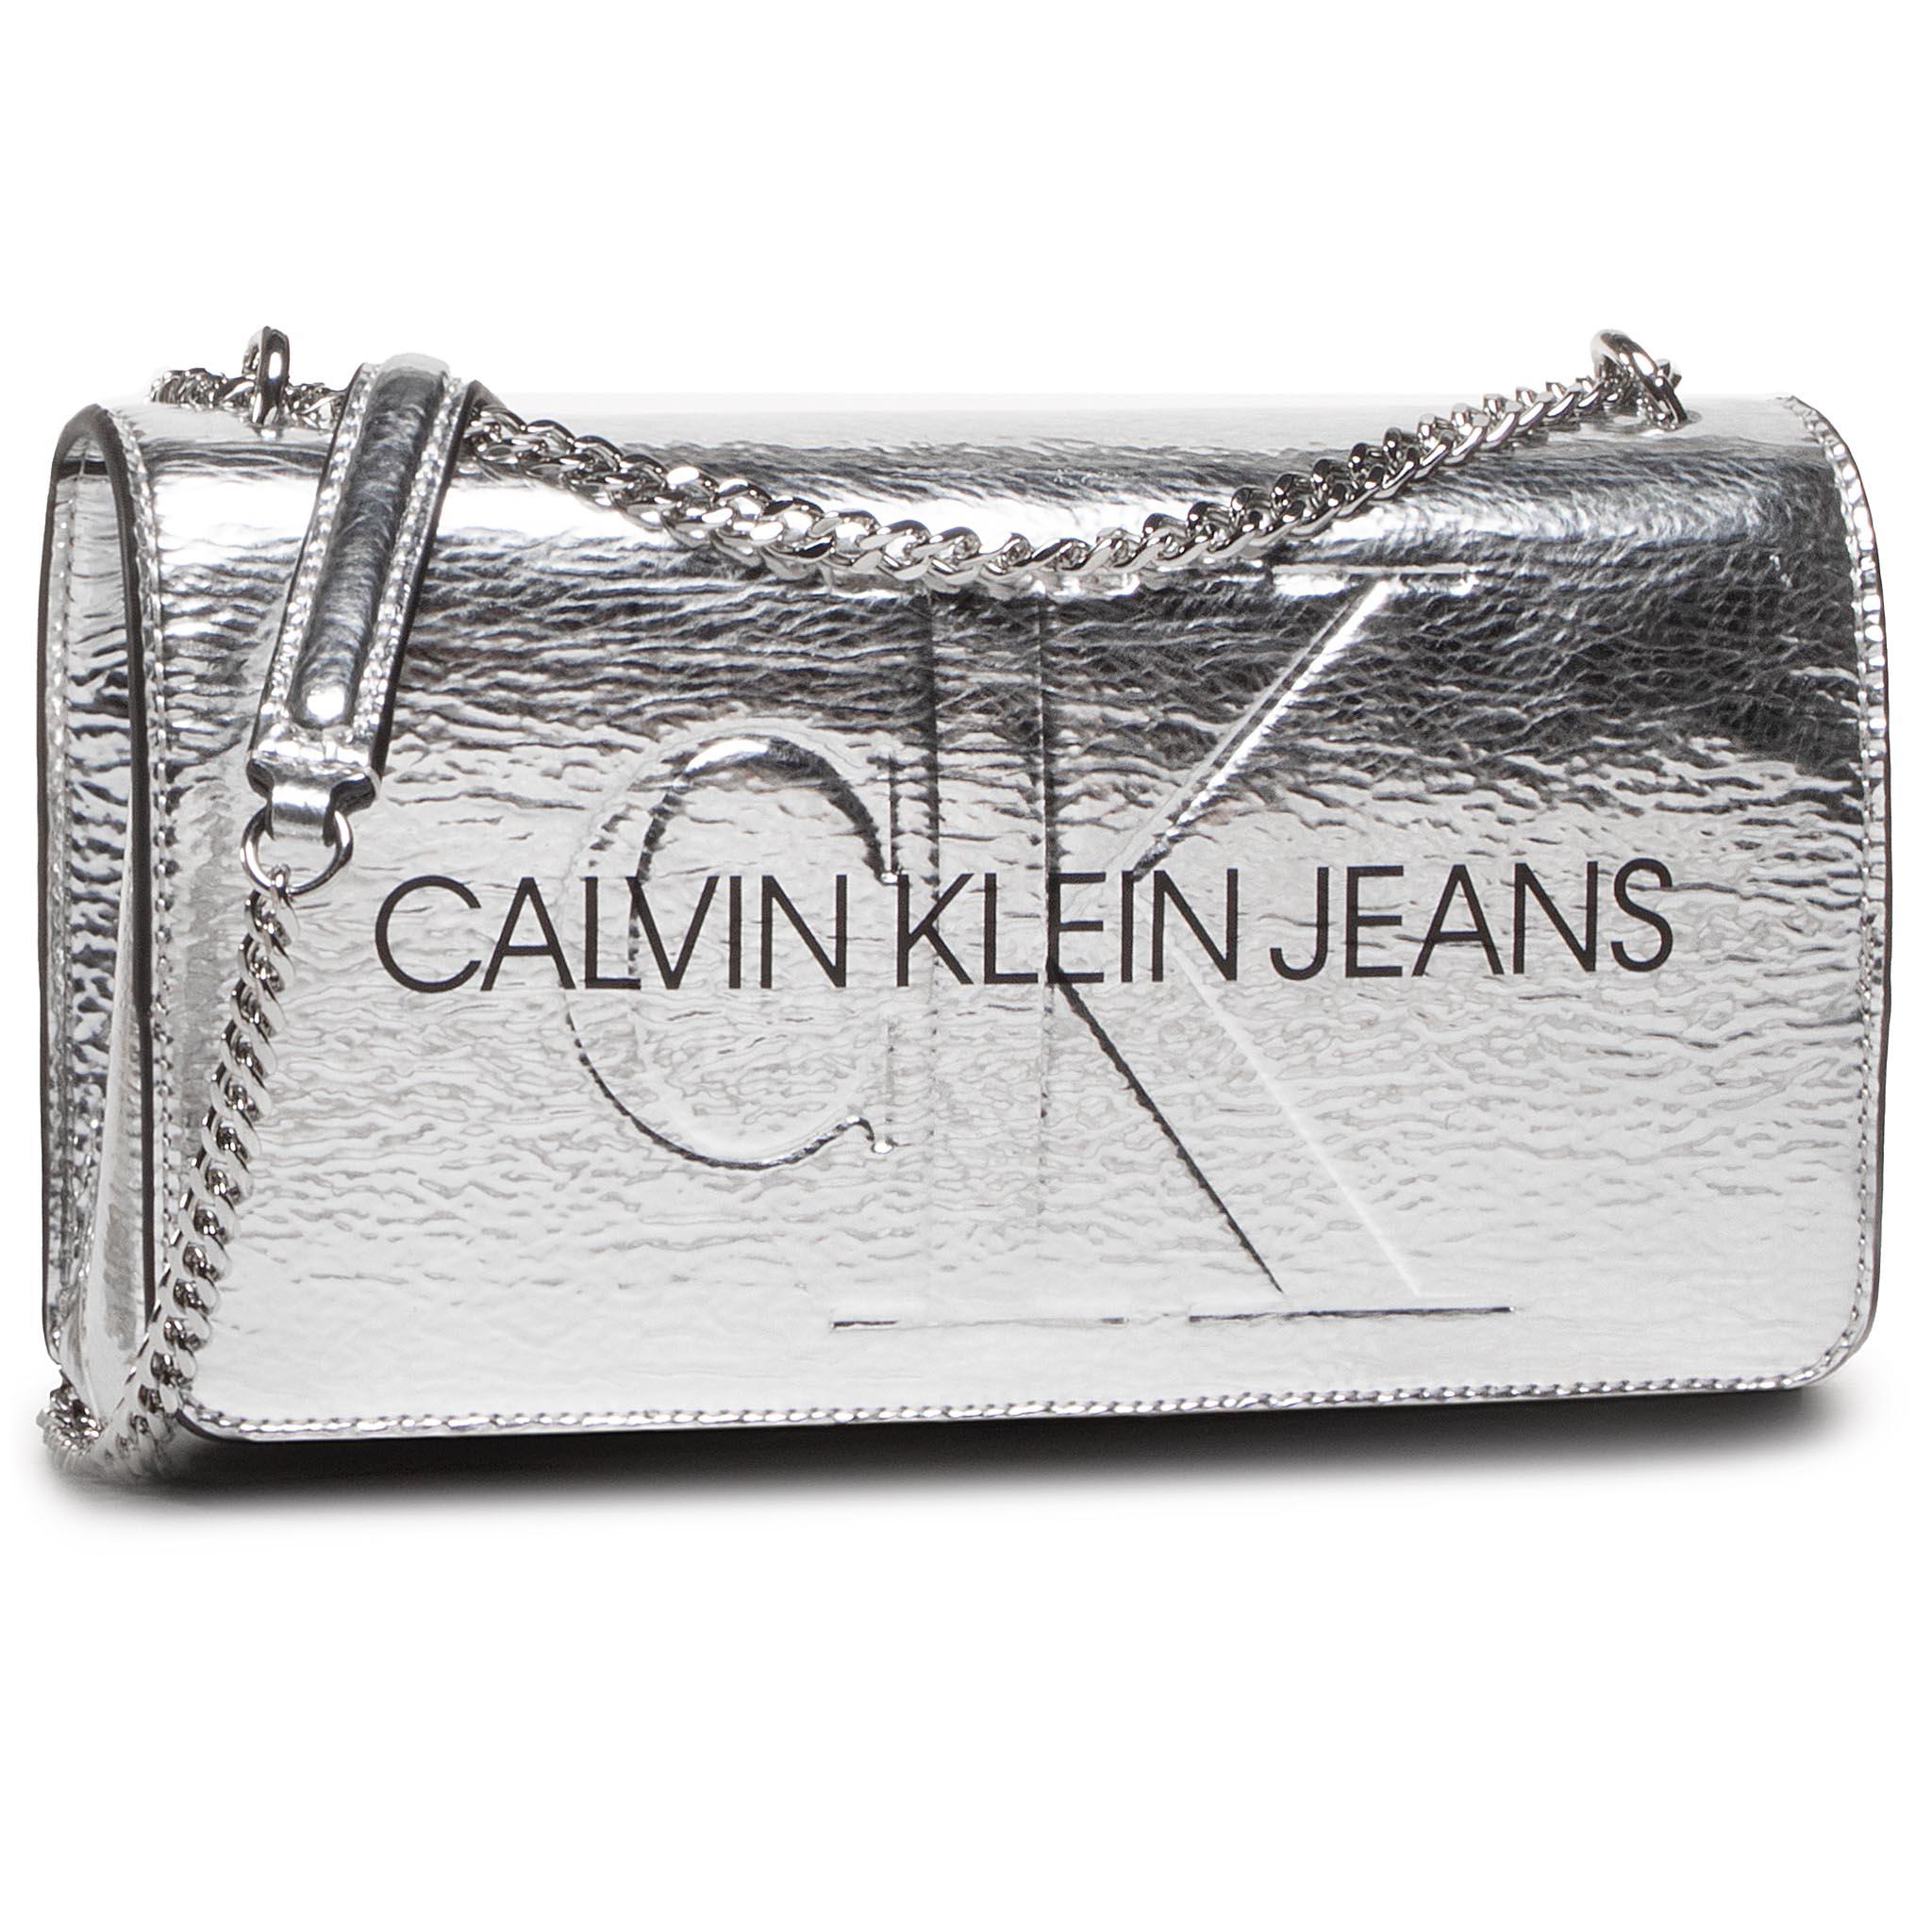 Image of Handtasche CALVIN KLEIN JEANS - Convertible Ew Flap Silver K60K607620 0GT